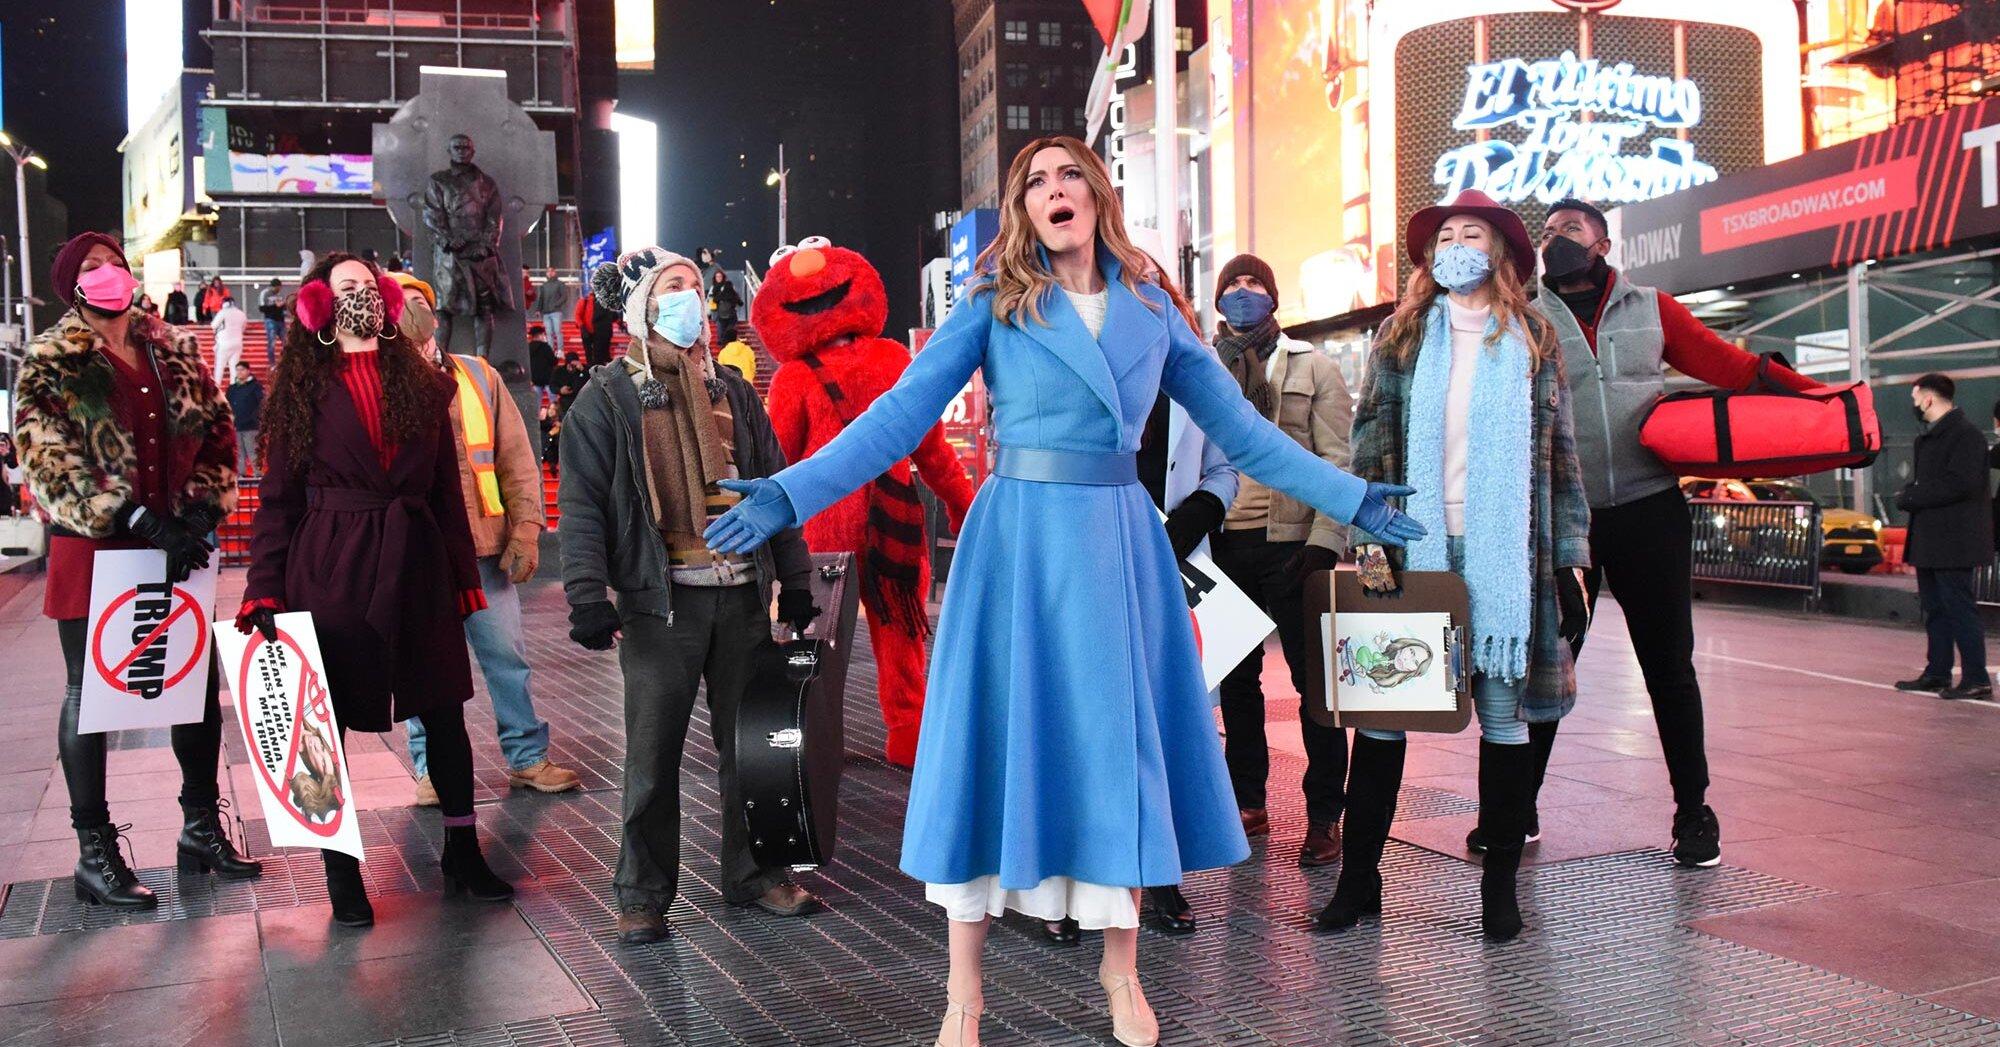 New York City tells Laura Benanti's Melania Trump to 'f--- off' in 'Late Show' musical sendoff